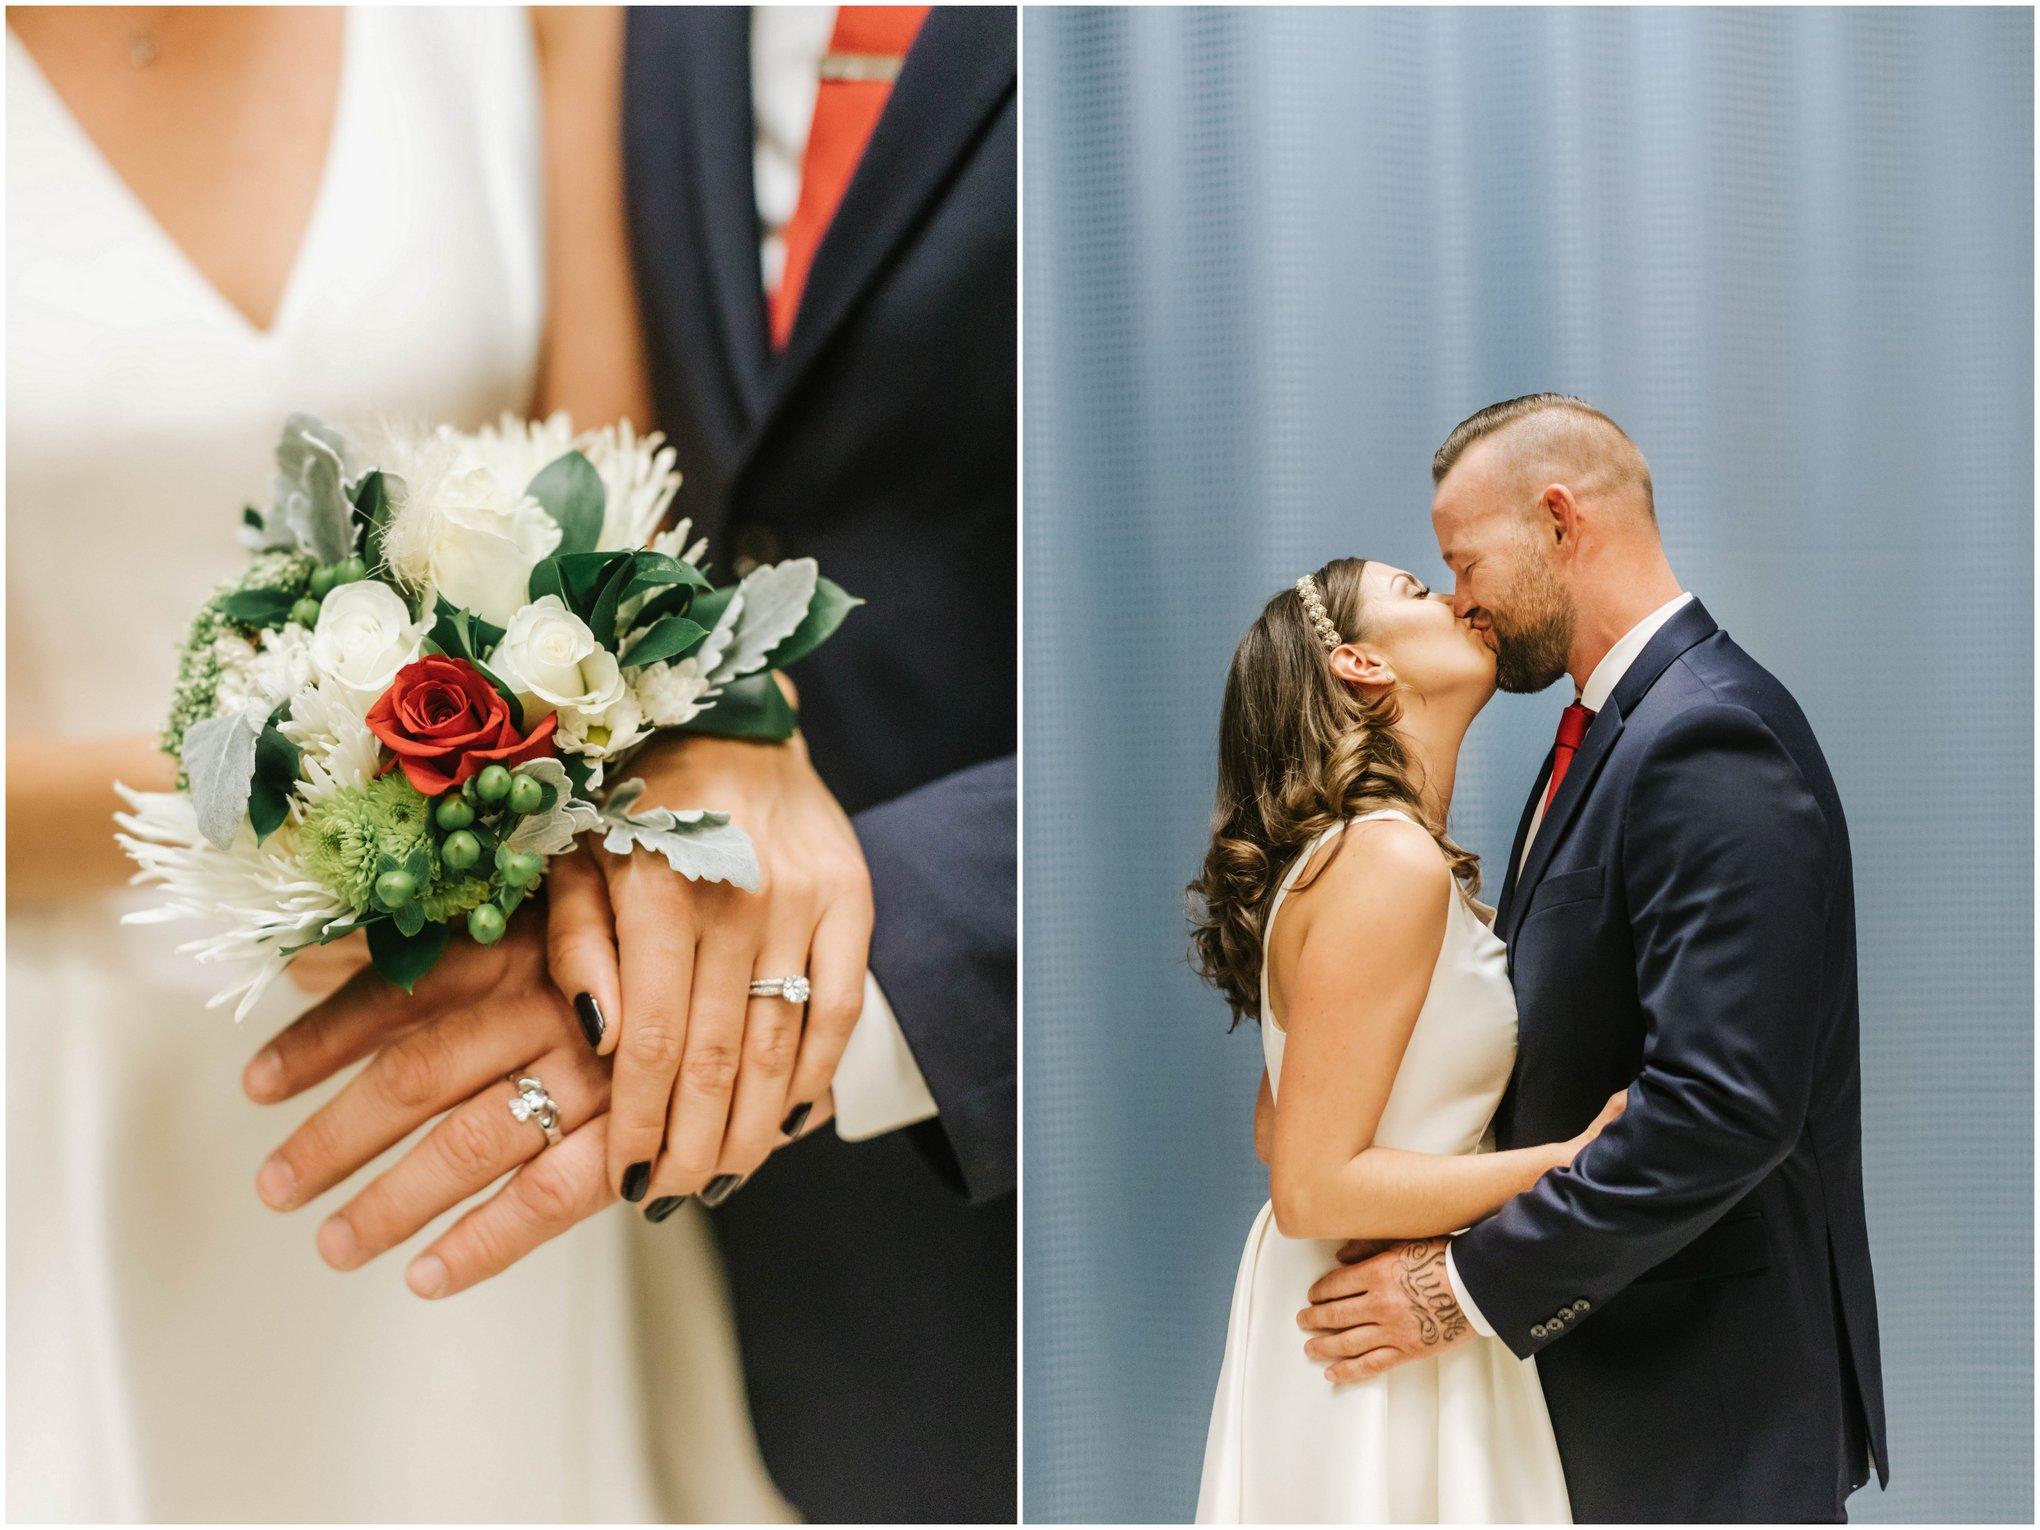 Boston-City-Hall-Wedding-Elopement-Photographer-Lena-Mirisola-3.JPG